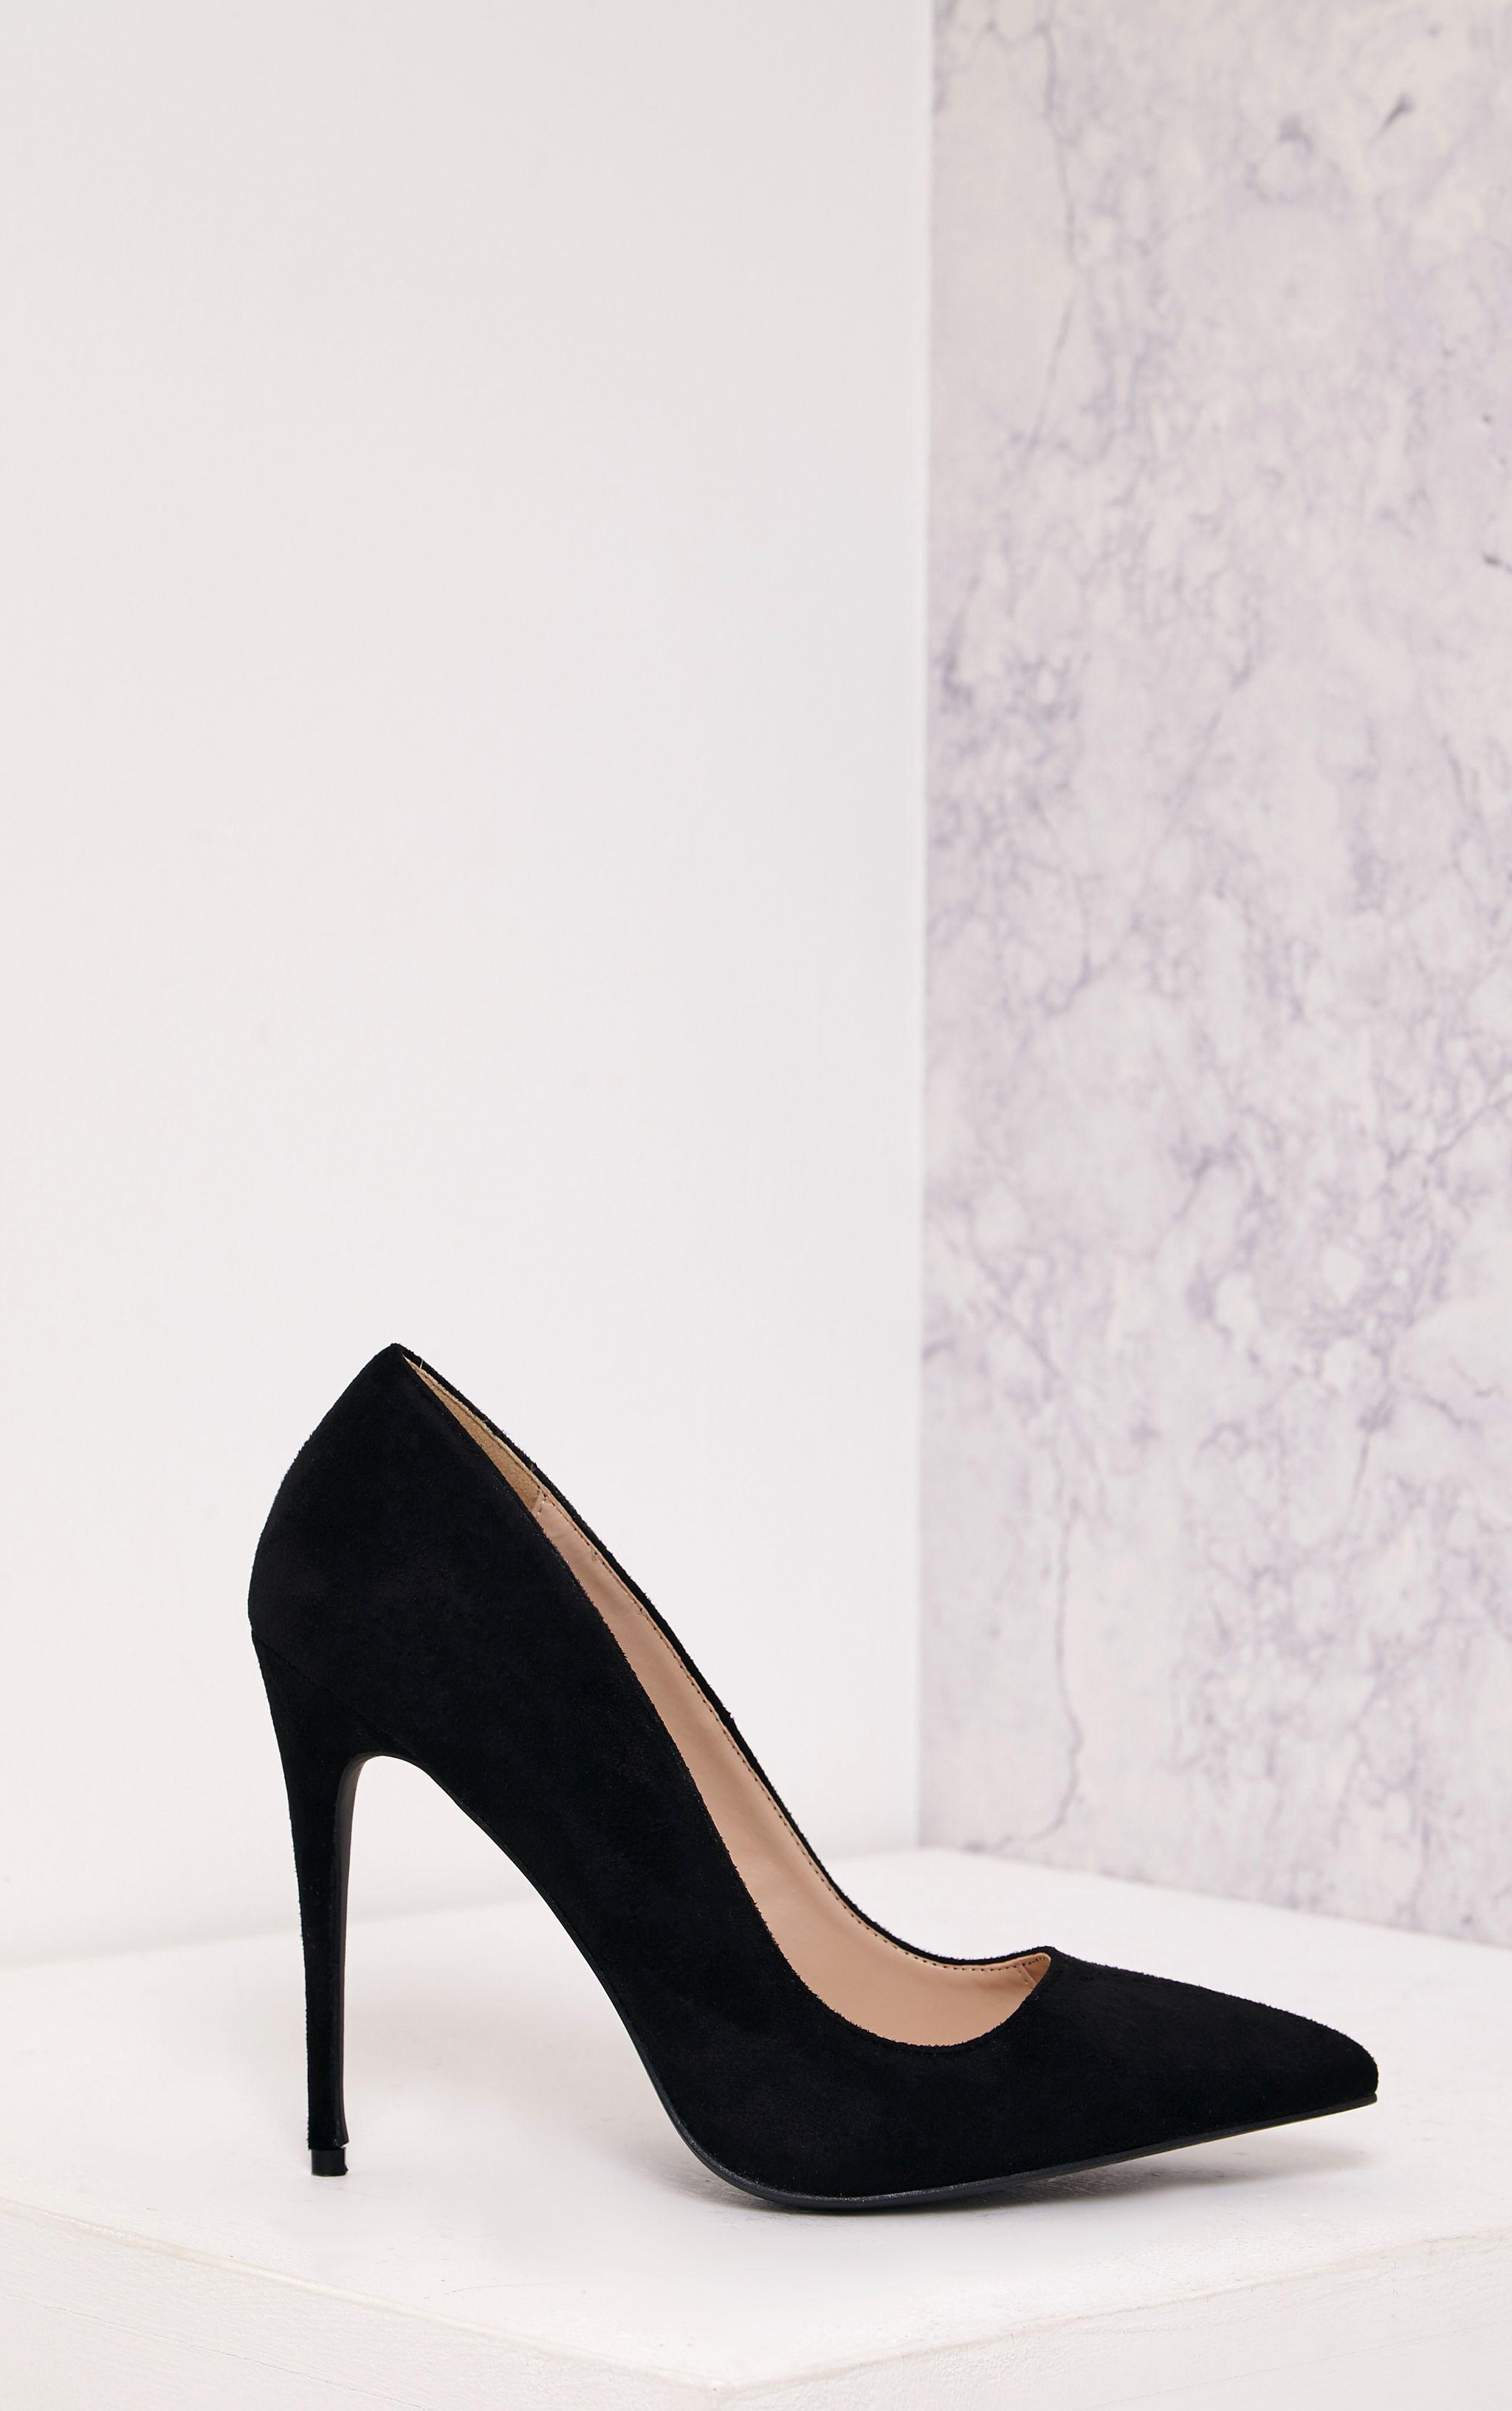 Dynah Black Faux Suede Pointed Heels